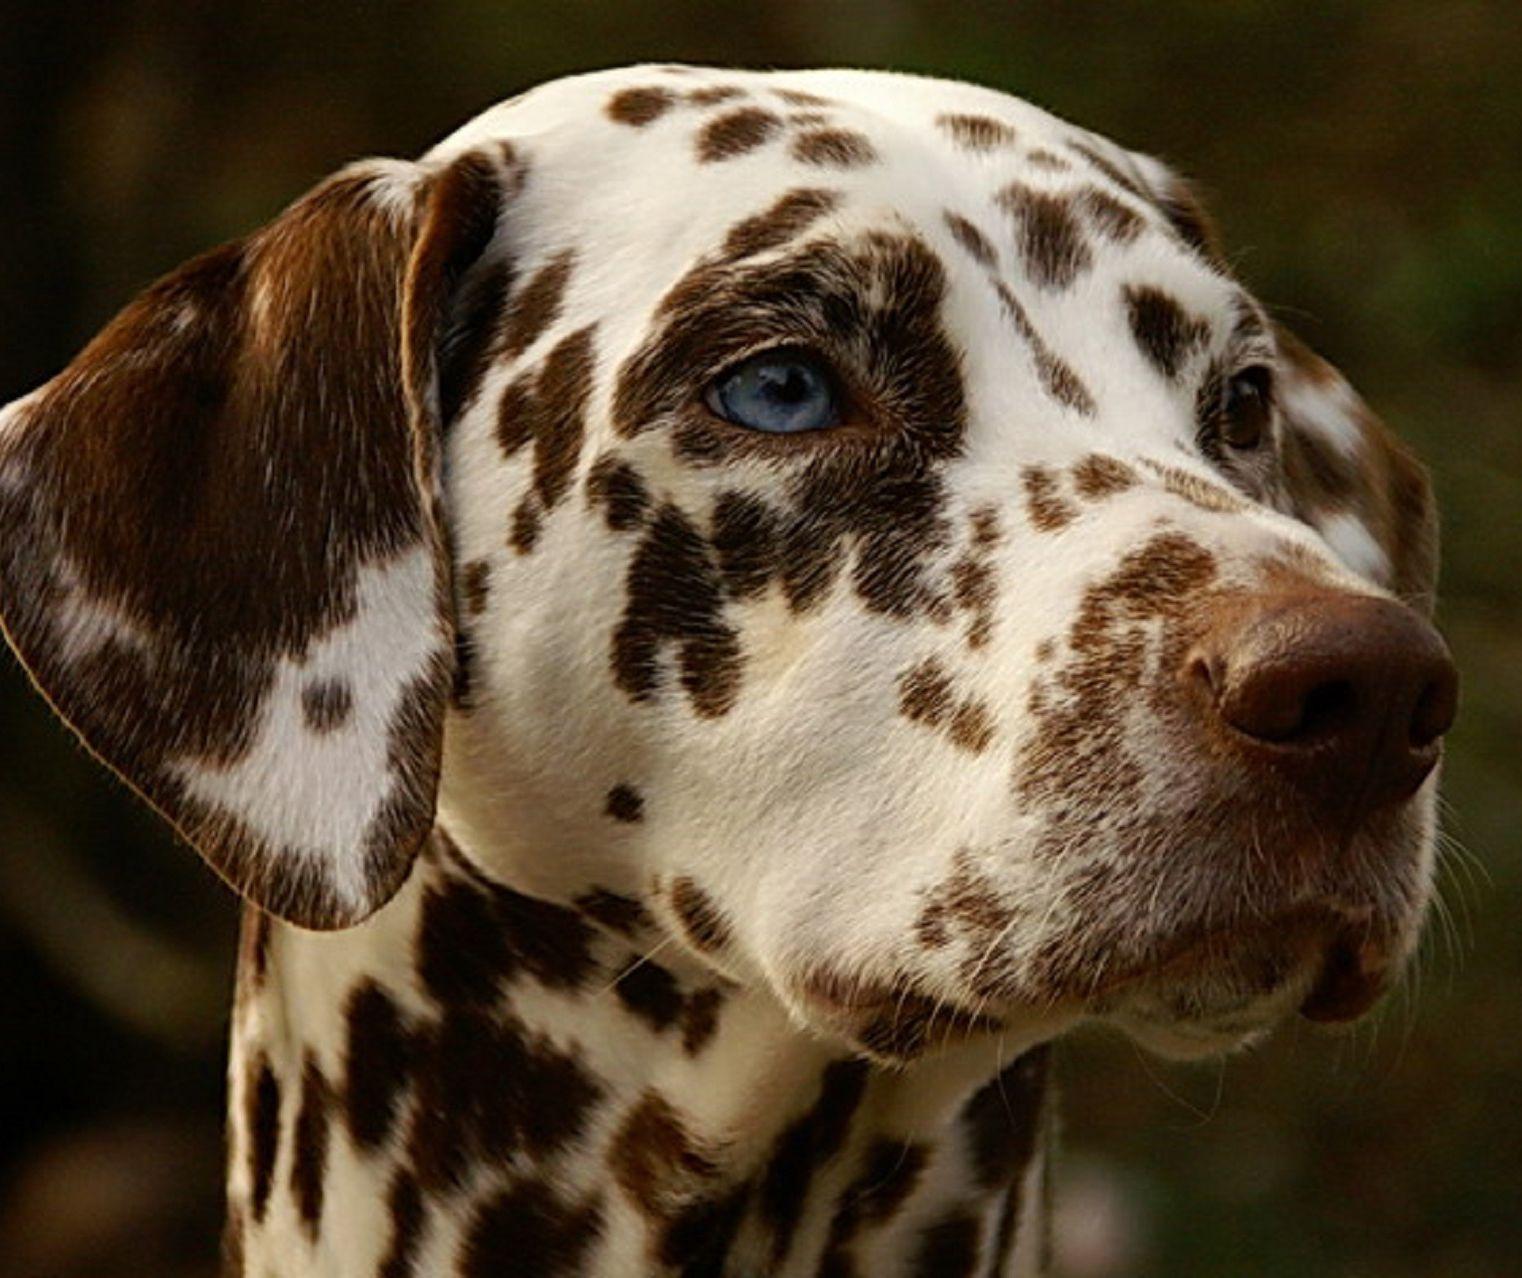 Purebred Dalmatian for sale on Pickapaw. Registered